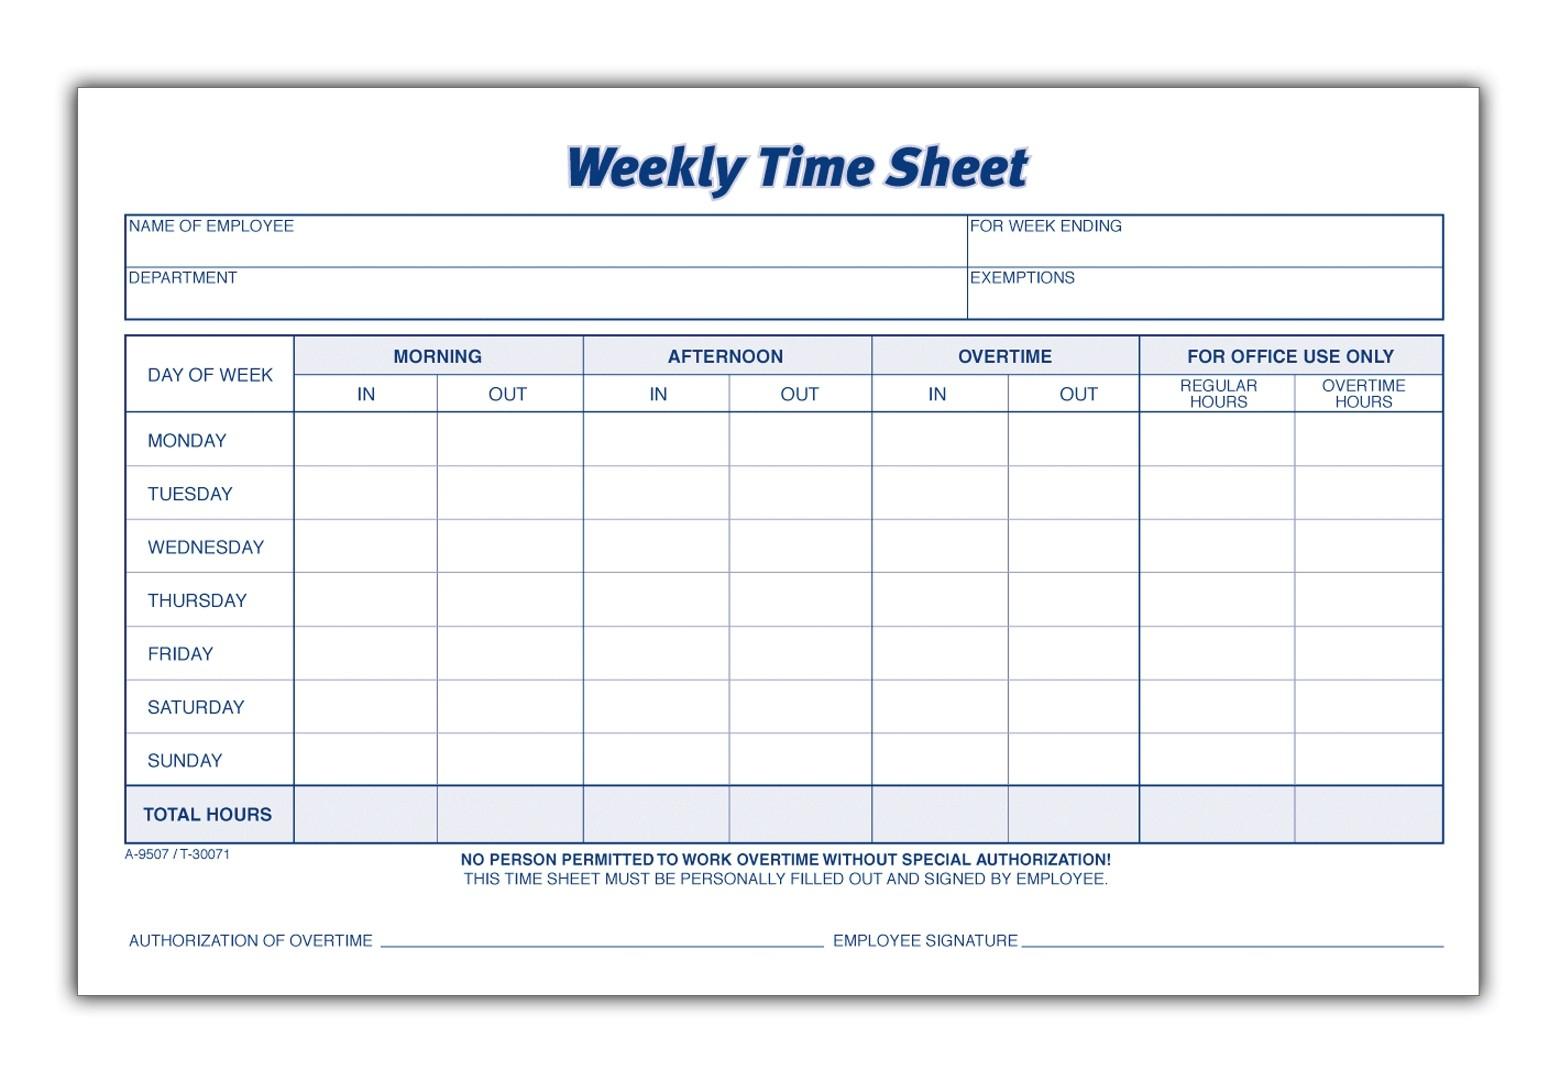 Time Sheet Gidiyeredformapoliticaco In Employee Timesheet Template And Employee Timesheet Spreadsheet